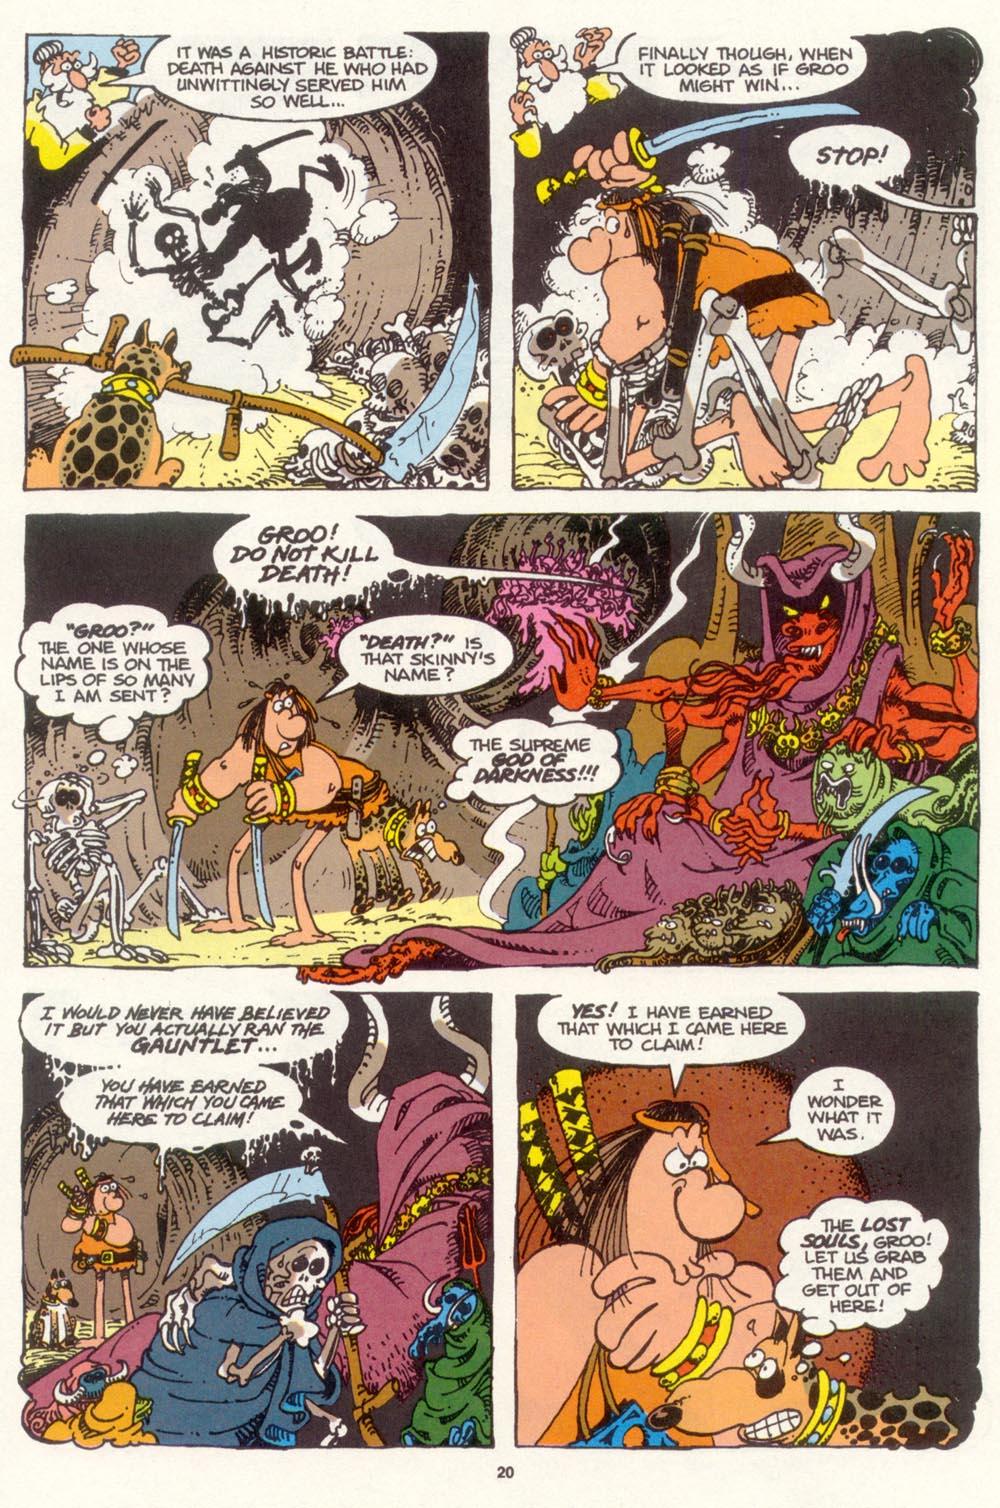 Read online Sergio Aragonés Groo the Wanderer comic -  Issue #99 - 21